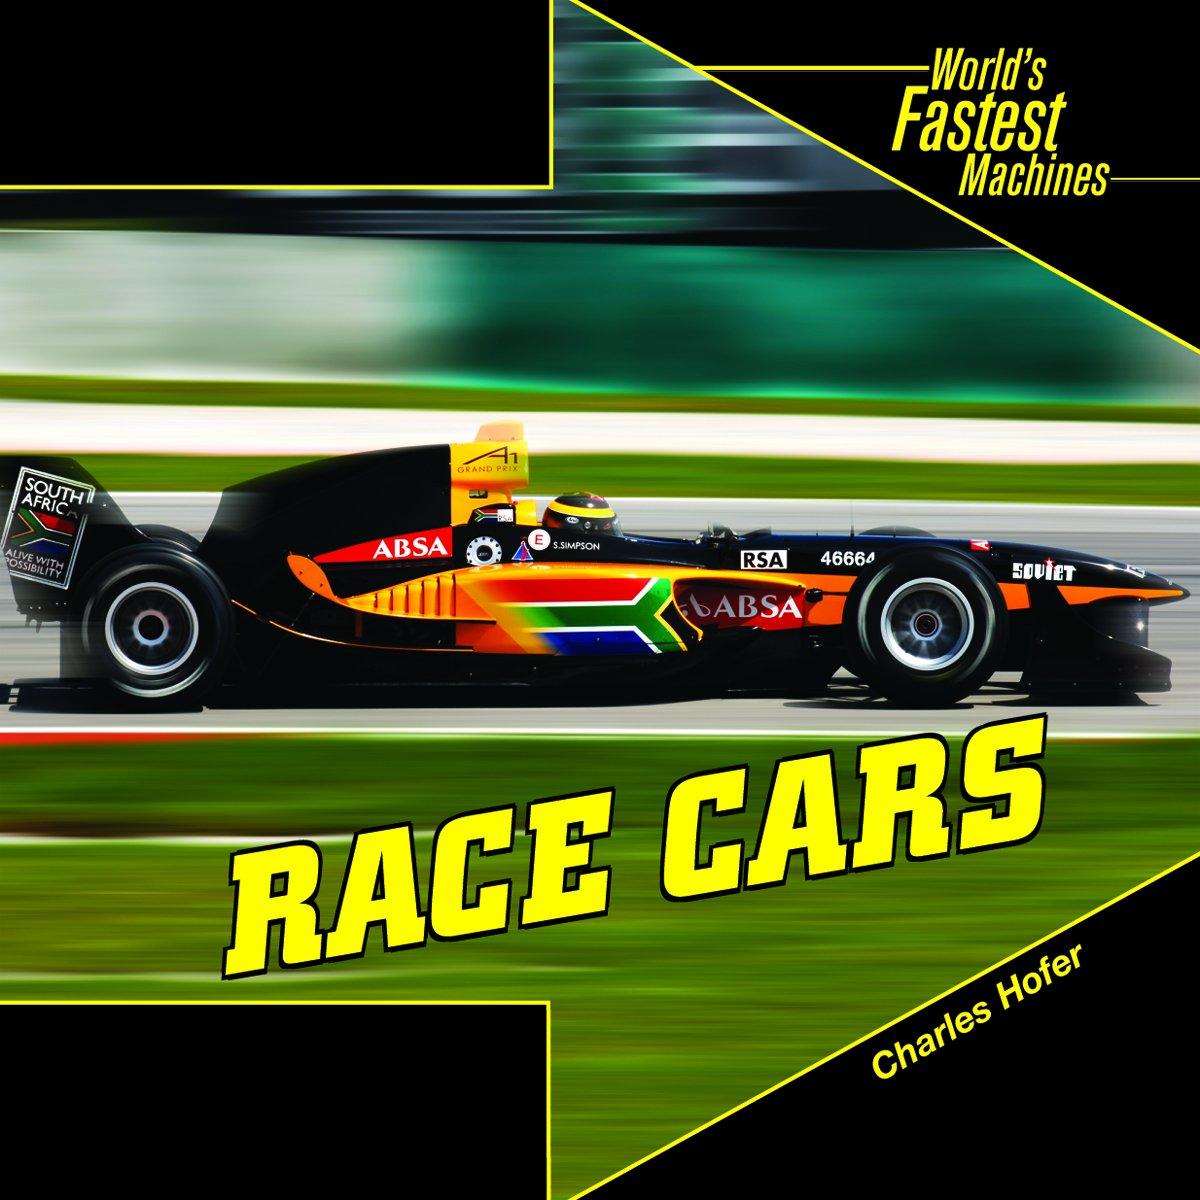 Race Cars World S Fastest Machines